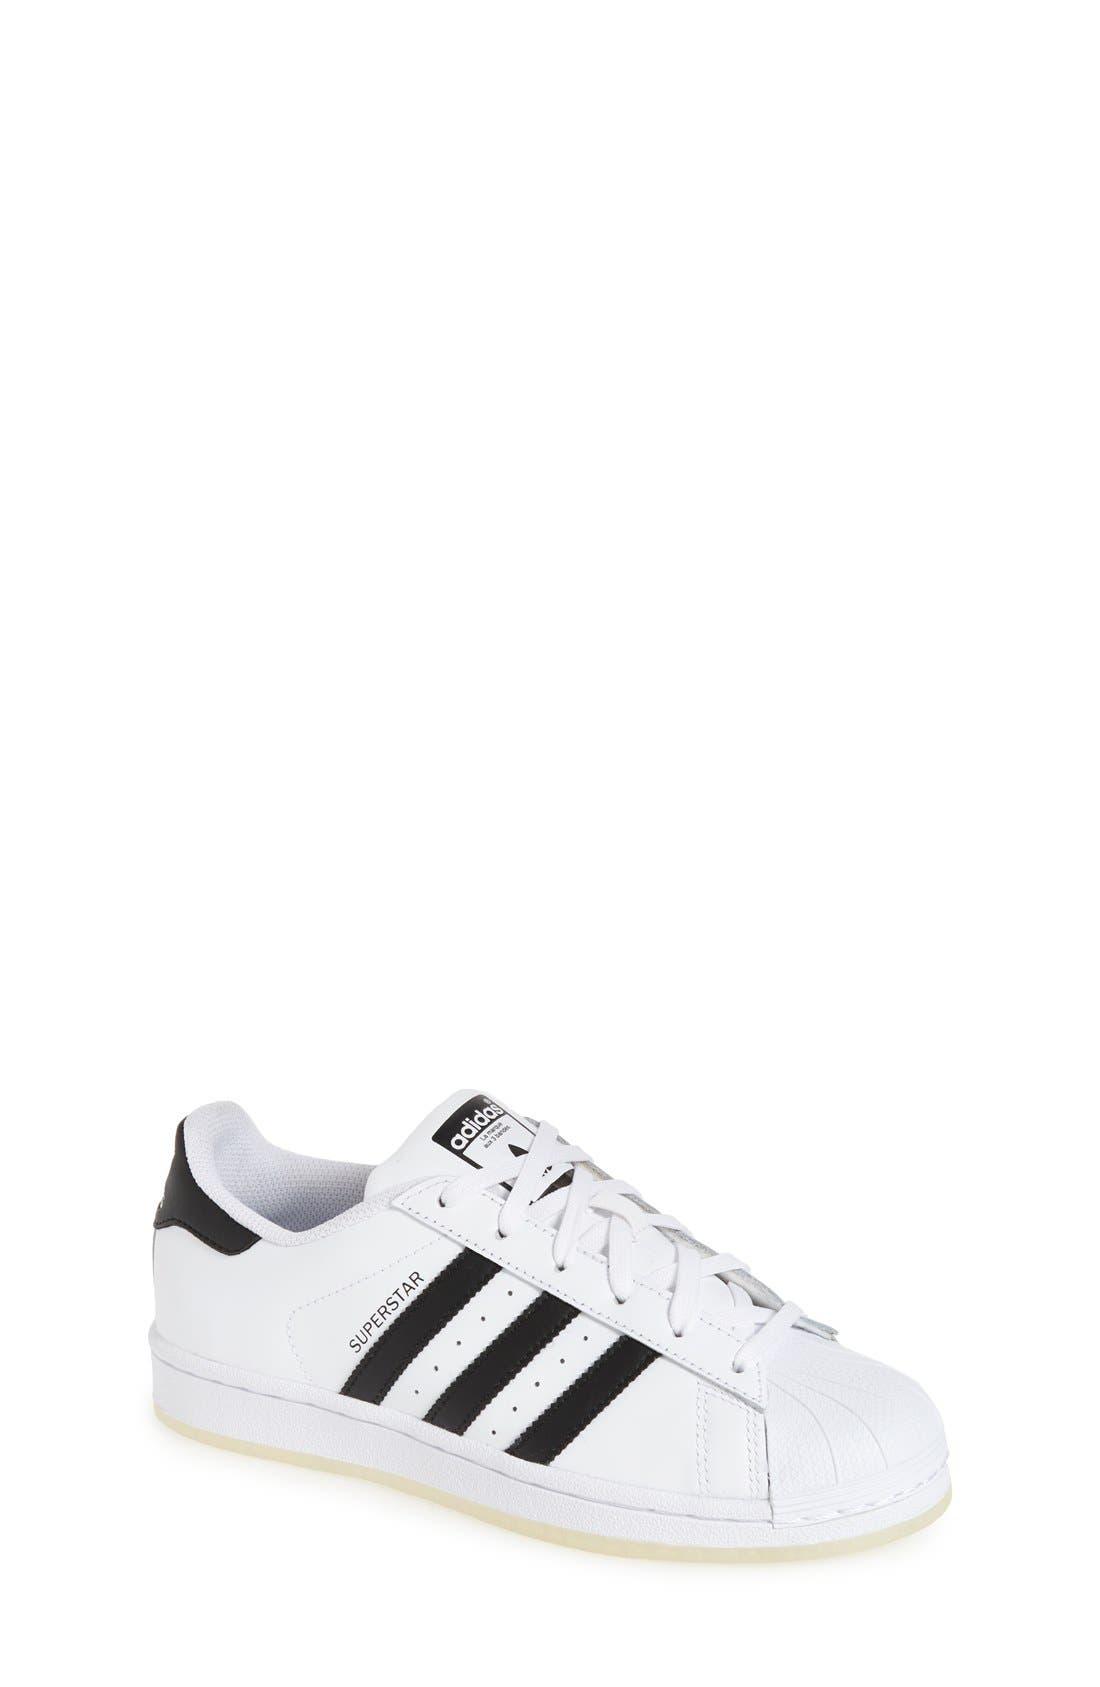 Main Image - adidas Superstar Ice Sneaker (Big Kid)